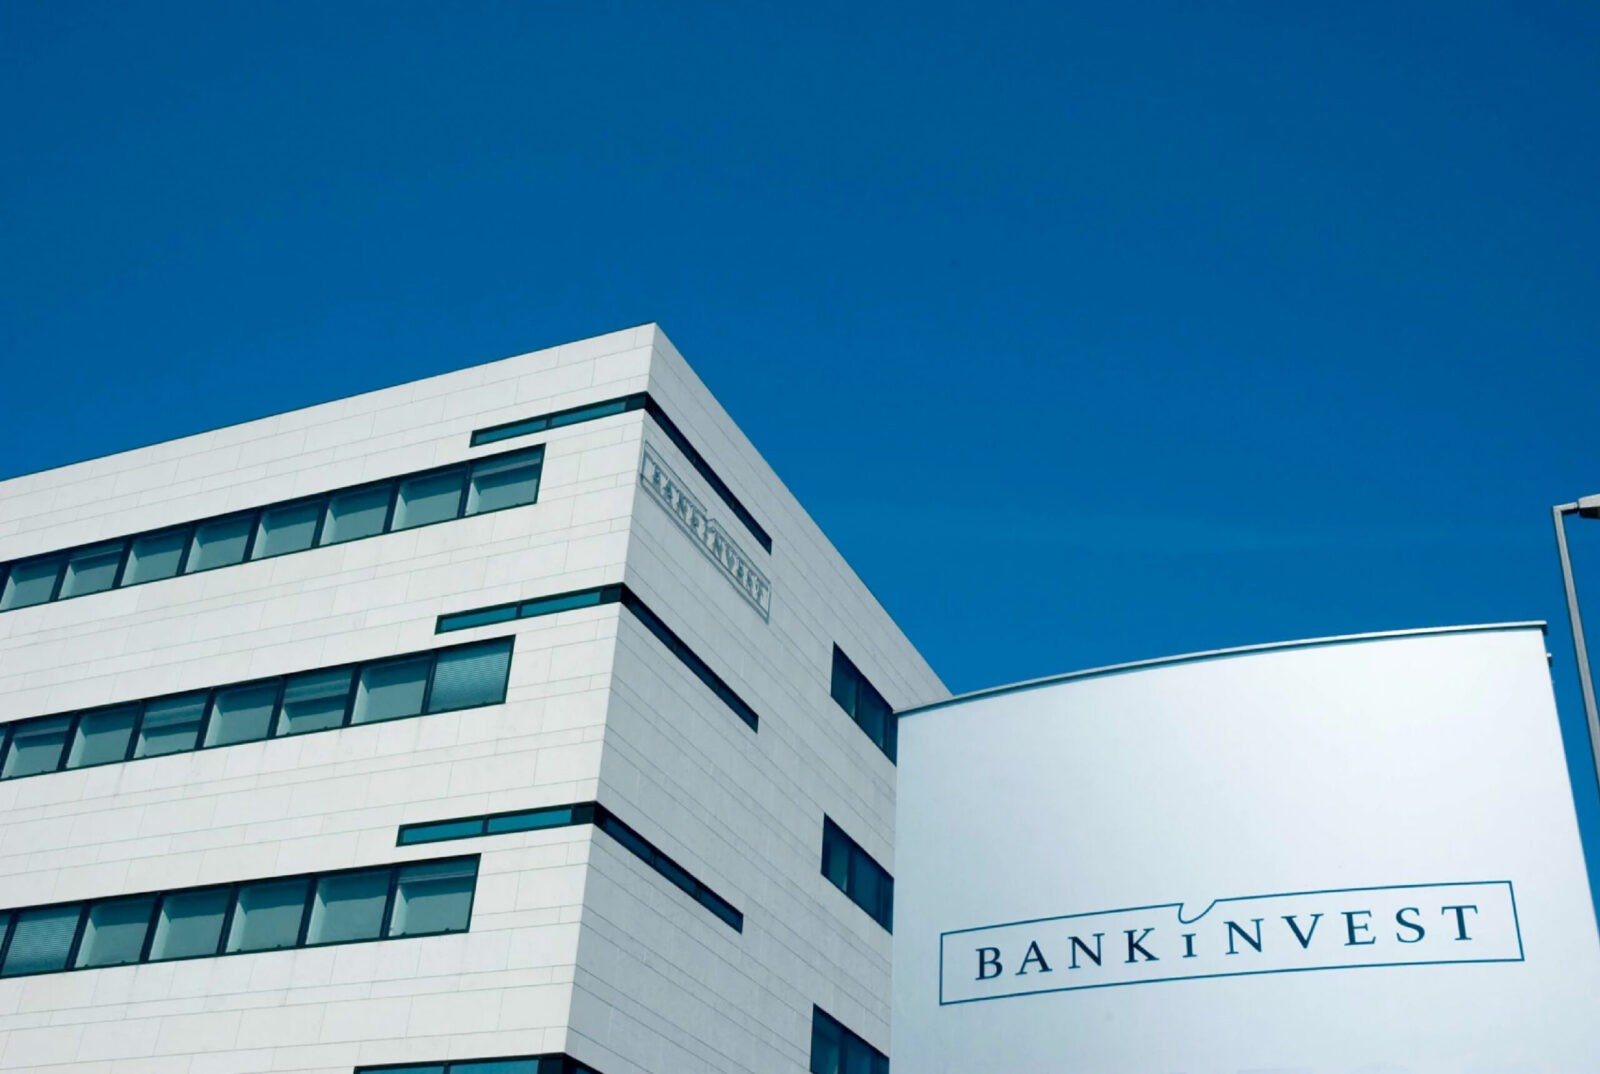 BankInvest